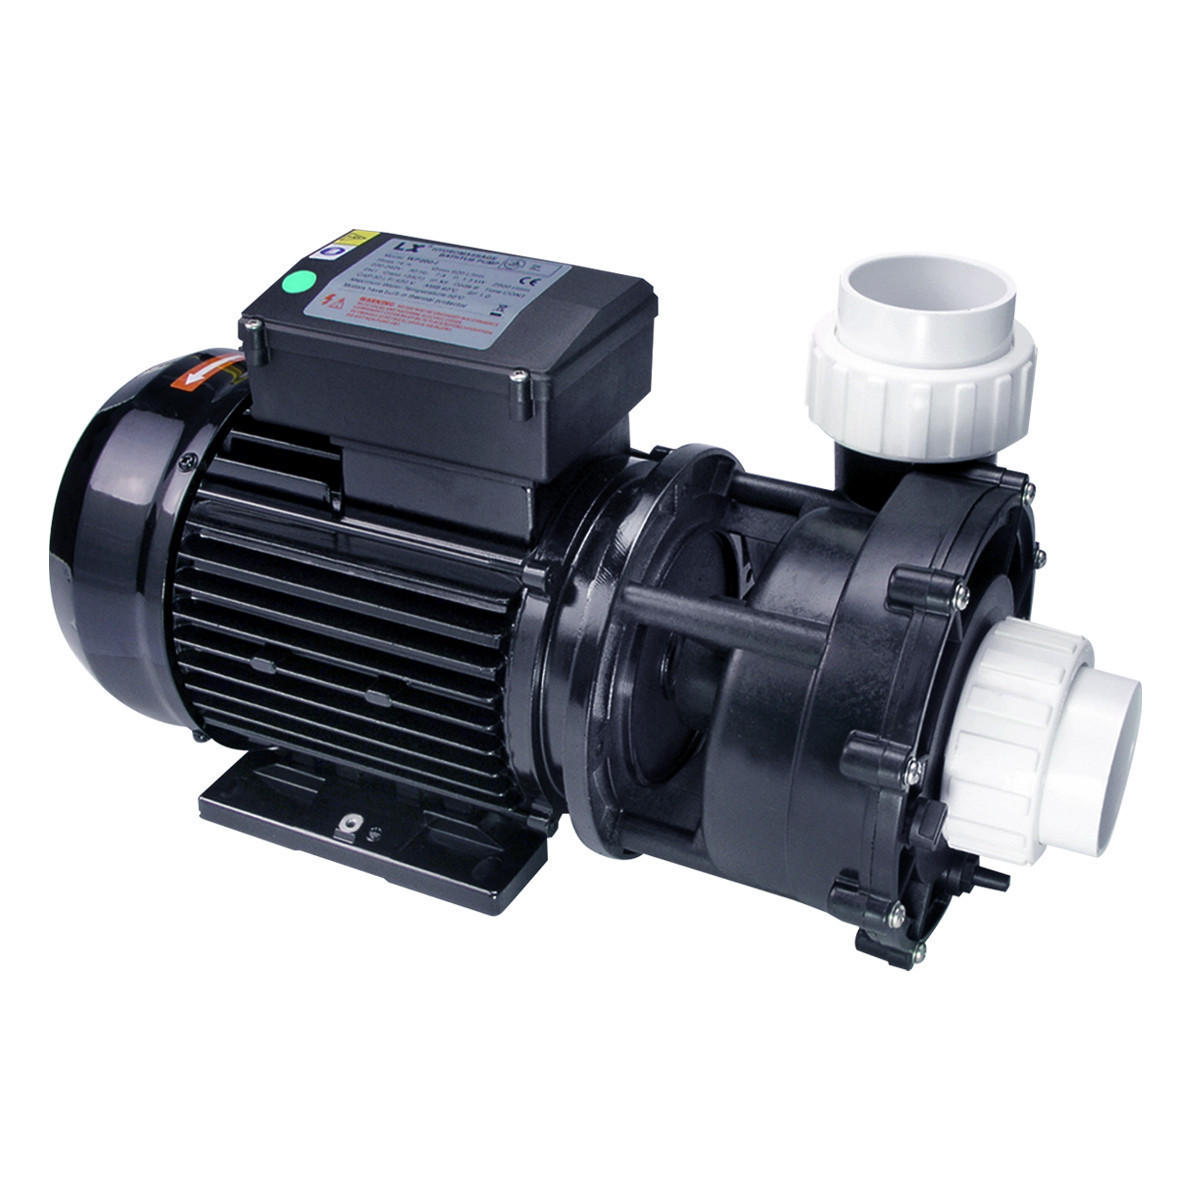 Насос AquaViva LX LP300M/OS300M 35 м³/ч (3HP, 220В)